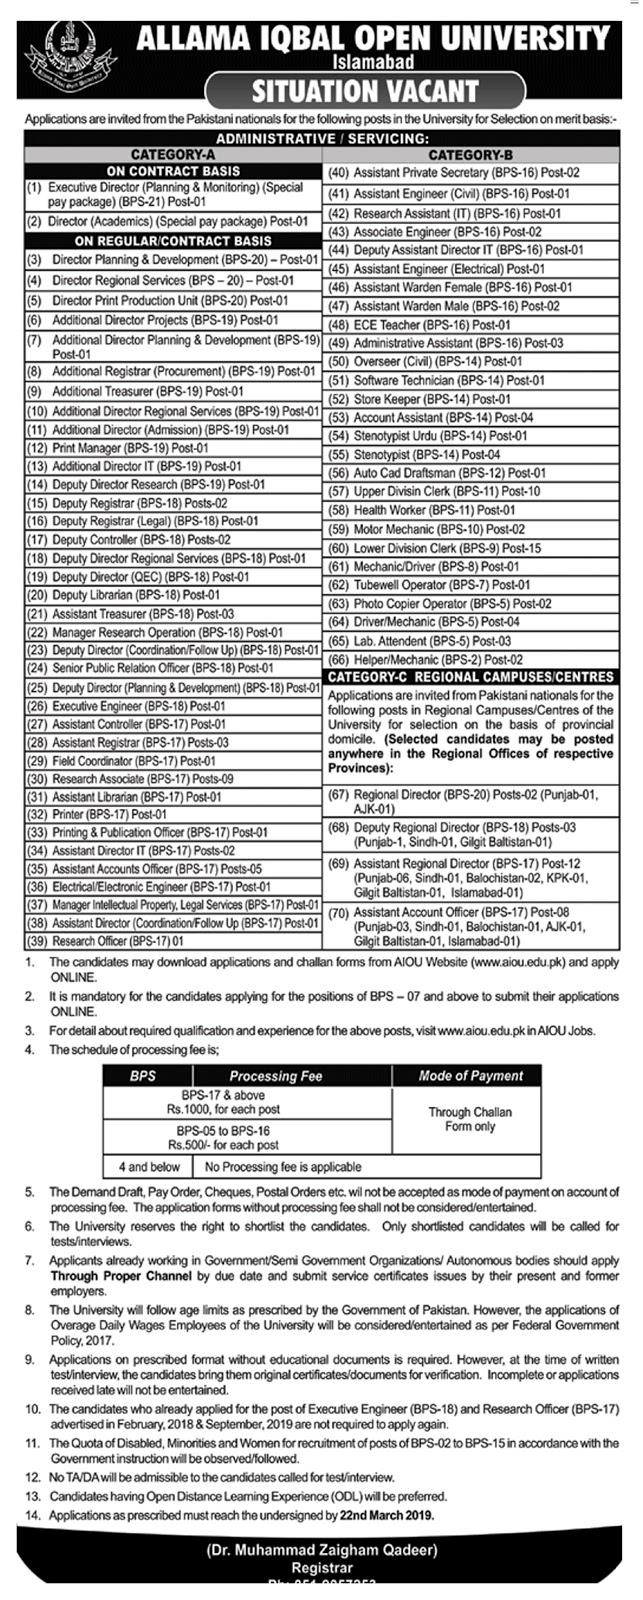 Allama Iqbal Open University Jobs 2019